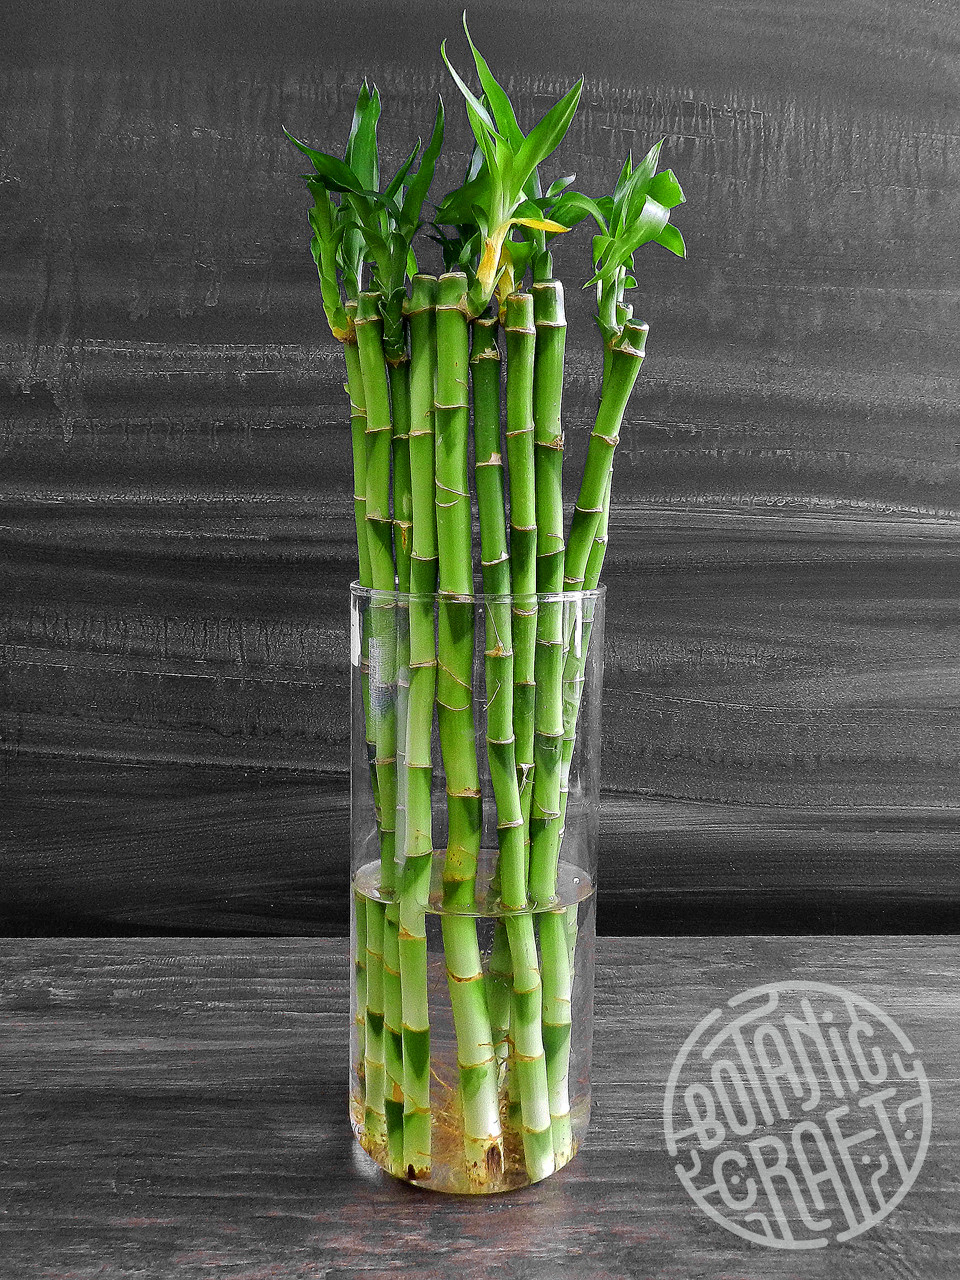 "lucky bamboo vase of d""n€dn†dµd½d ndd½ddµn€d lucky bamboo 1 nn'dµd±dµdnŒ botanic craft with regard to dŸd¾dodd·dn'nŒ d²ndµ n""d¾n'd¾d³n€dn""d¸d¸"